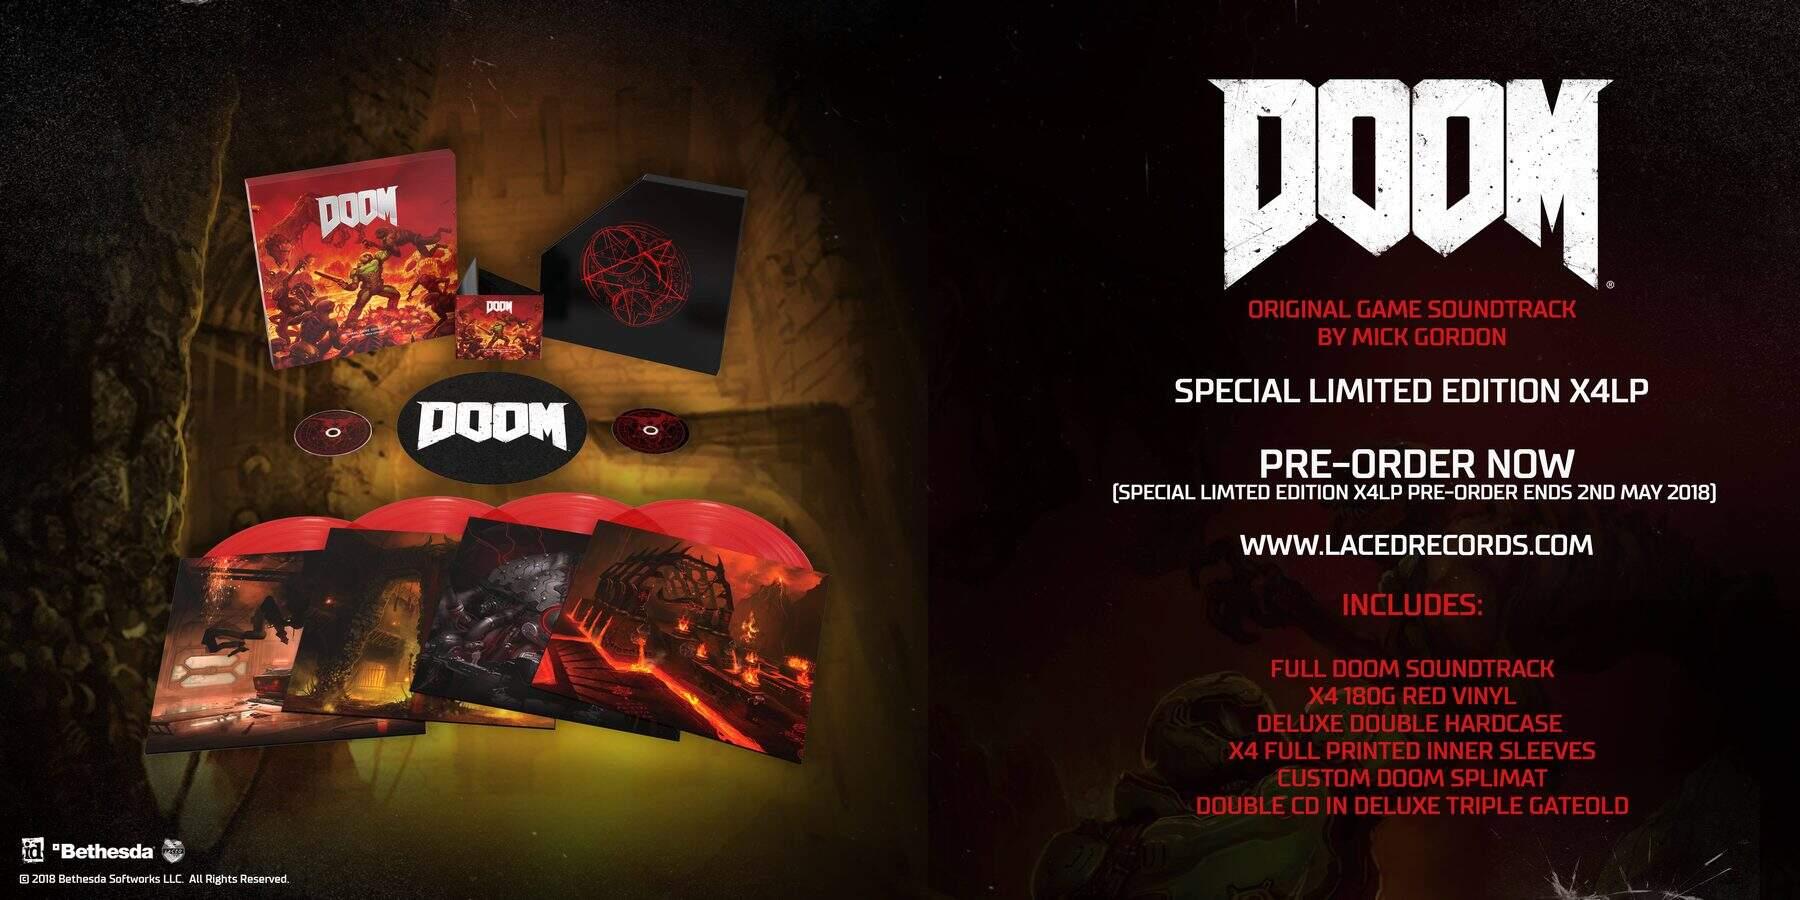 DOOM Soundtrack Vinyl